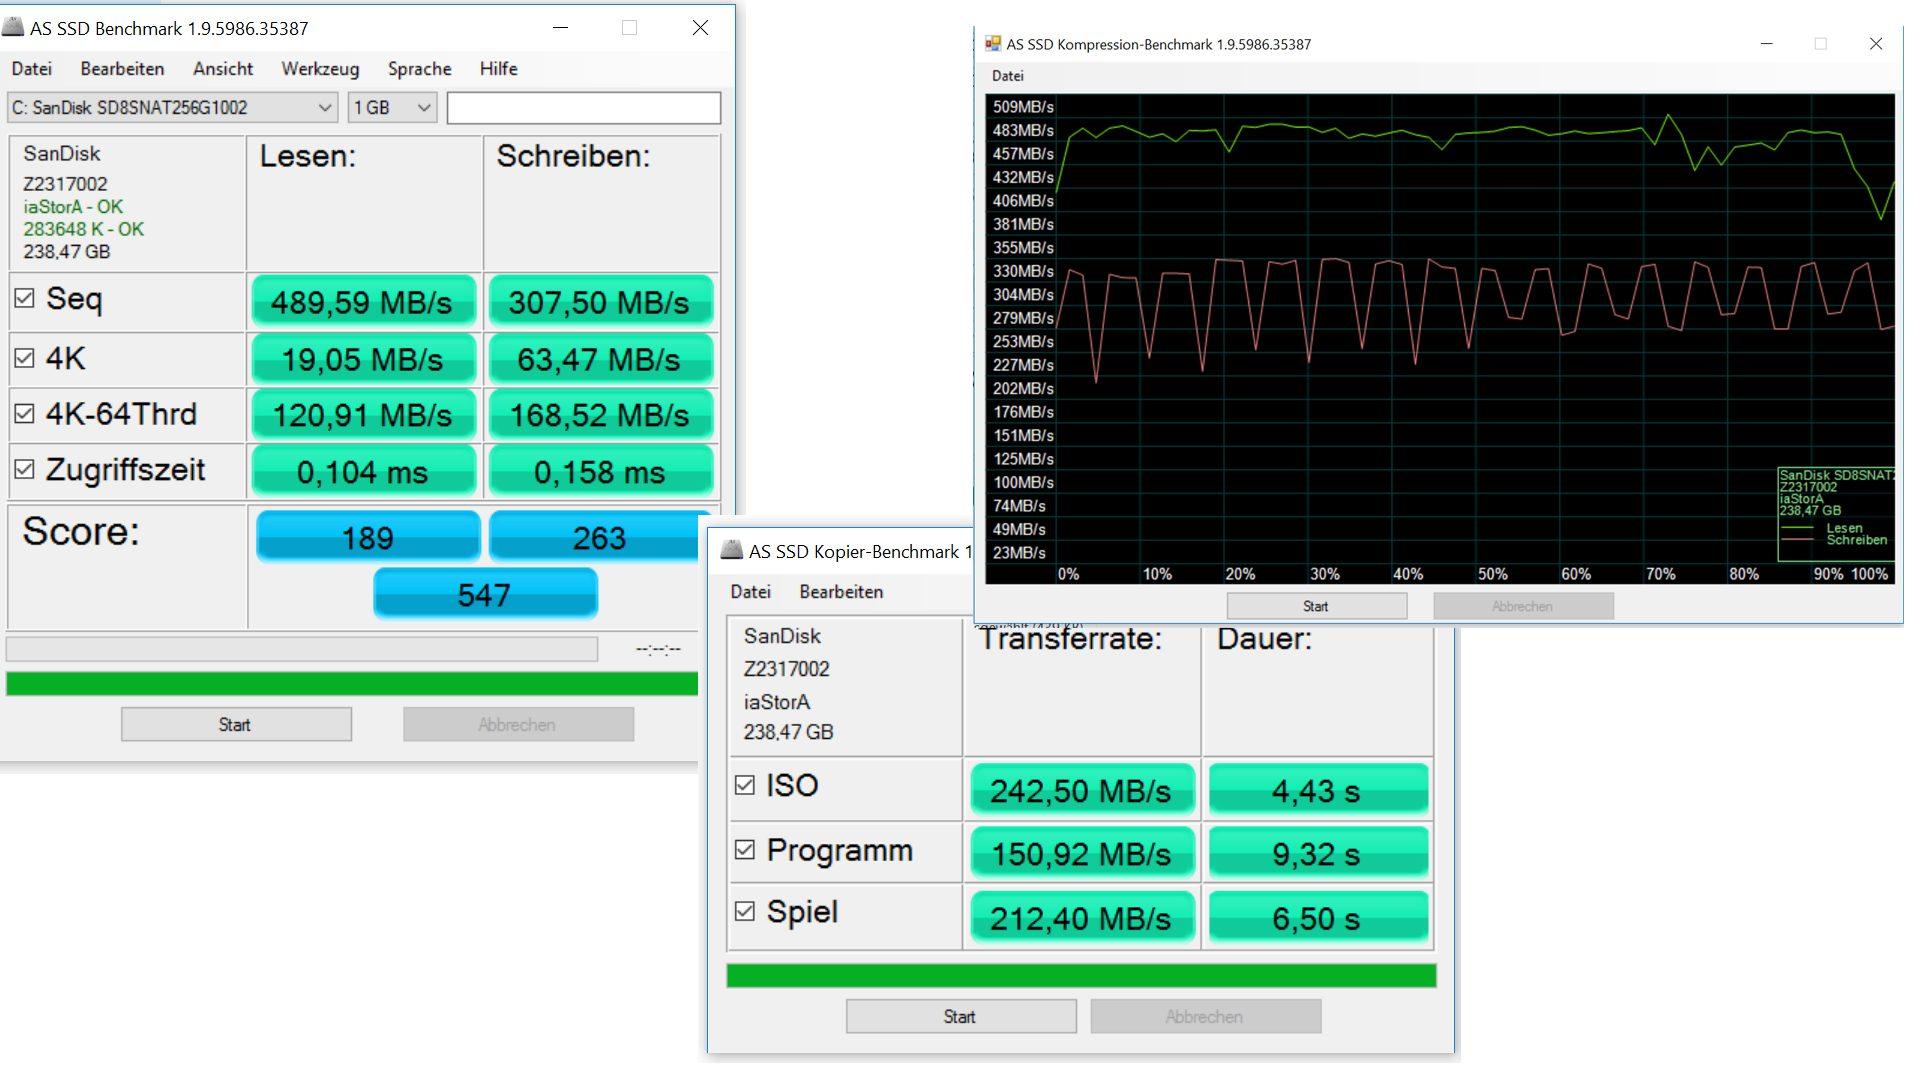 asus-zenbook-ux310ua-fc114t-benchmark-6